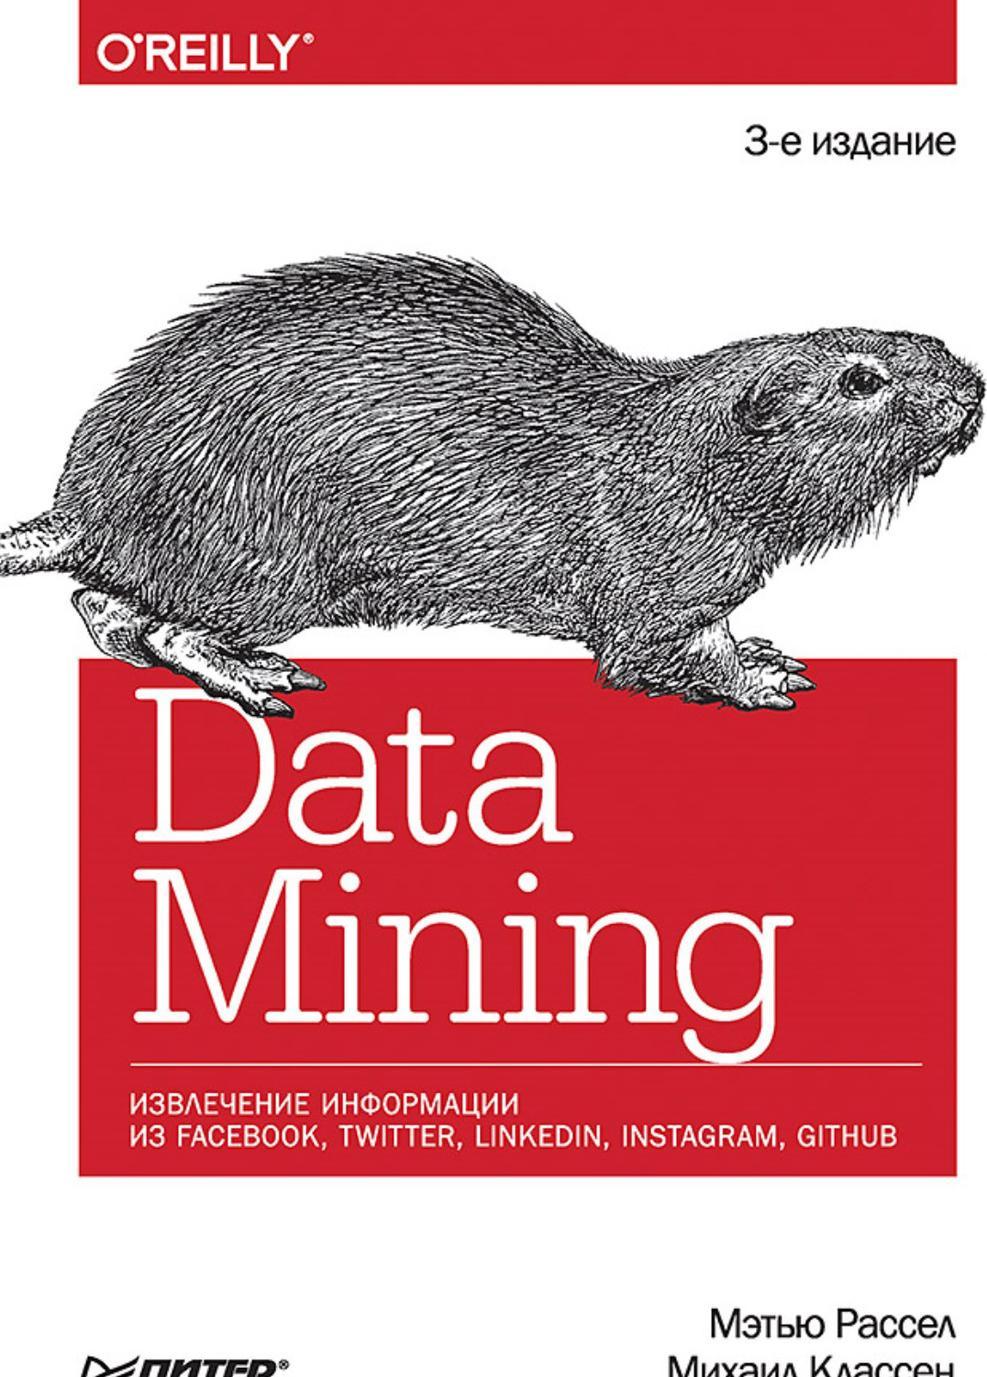 Data mining. Izvlechenie informatsii iz Facebook, Twitter, LinkedIn, Instagram, GitHub